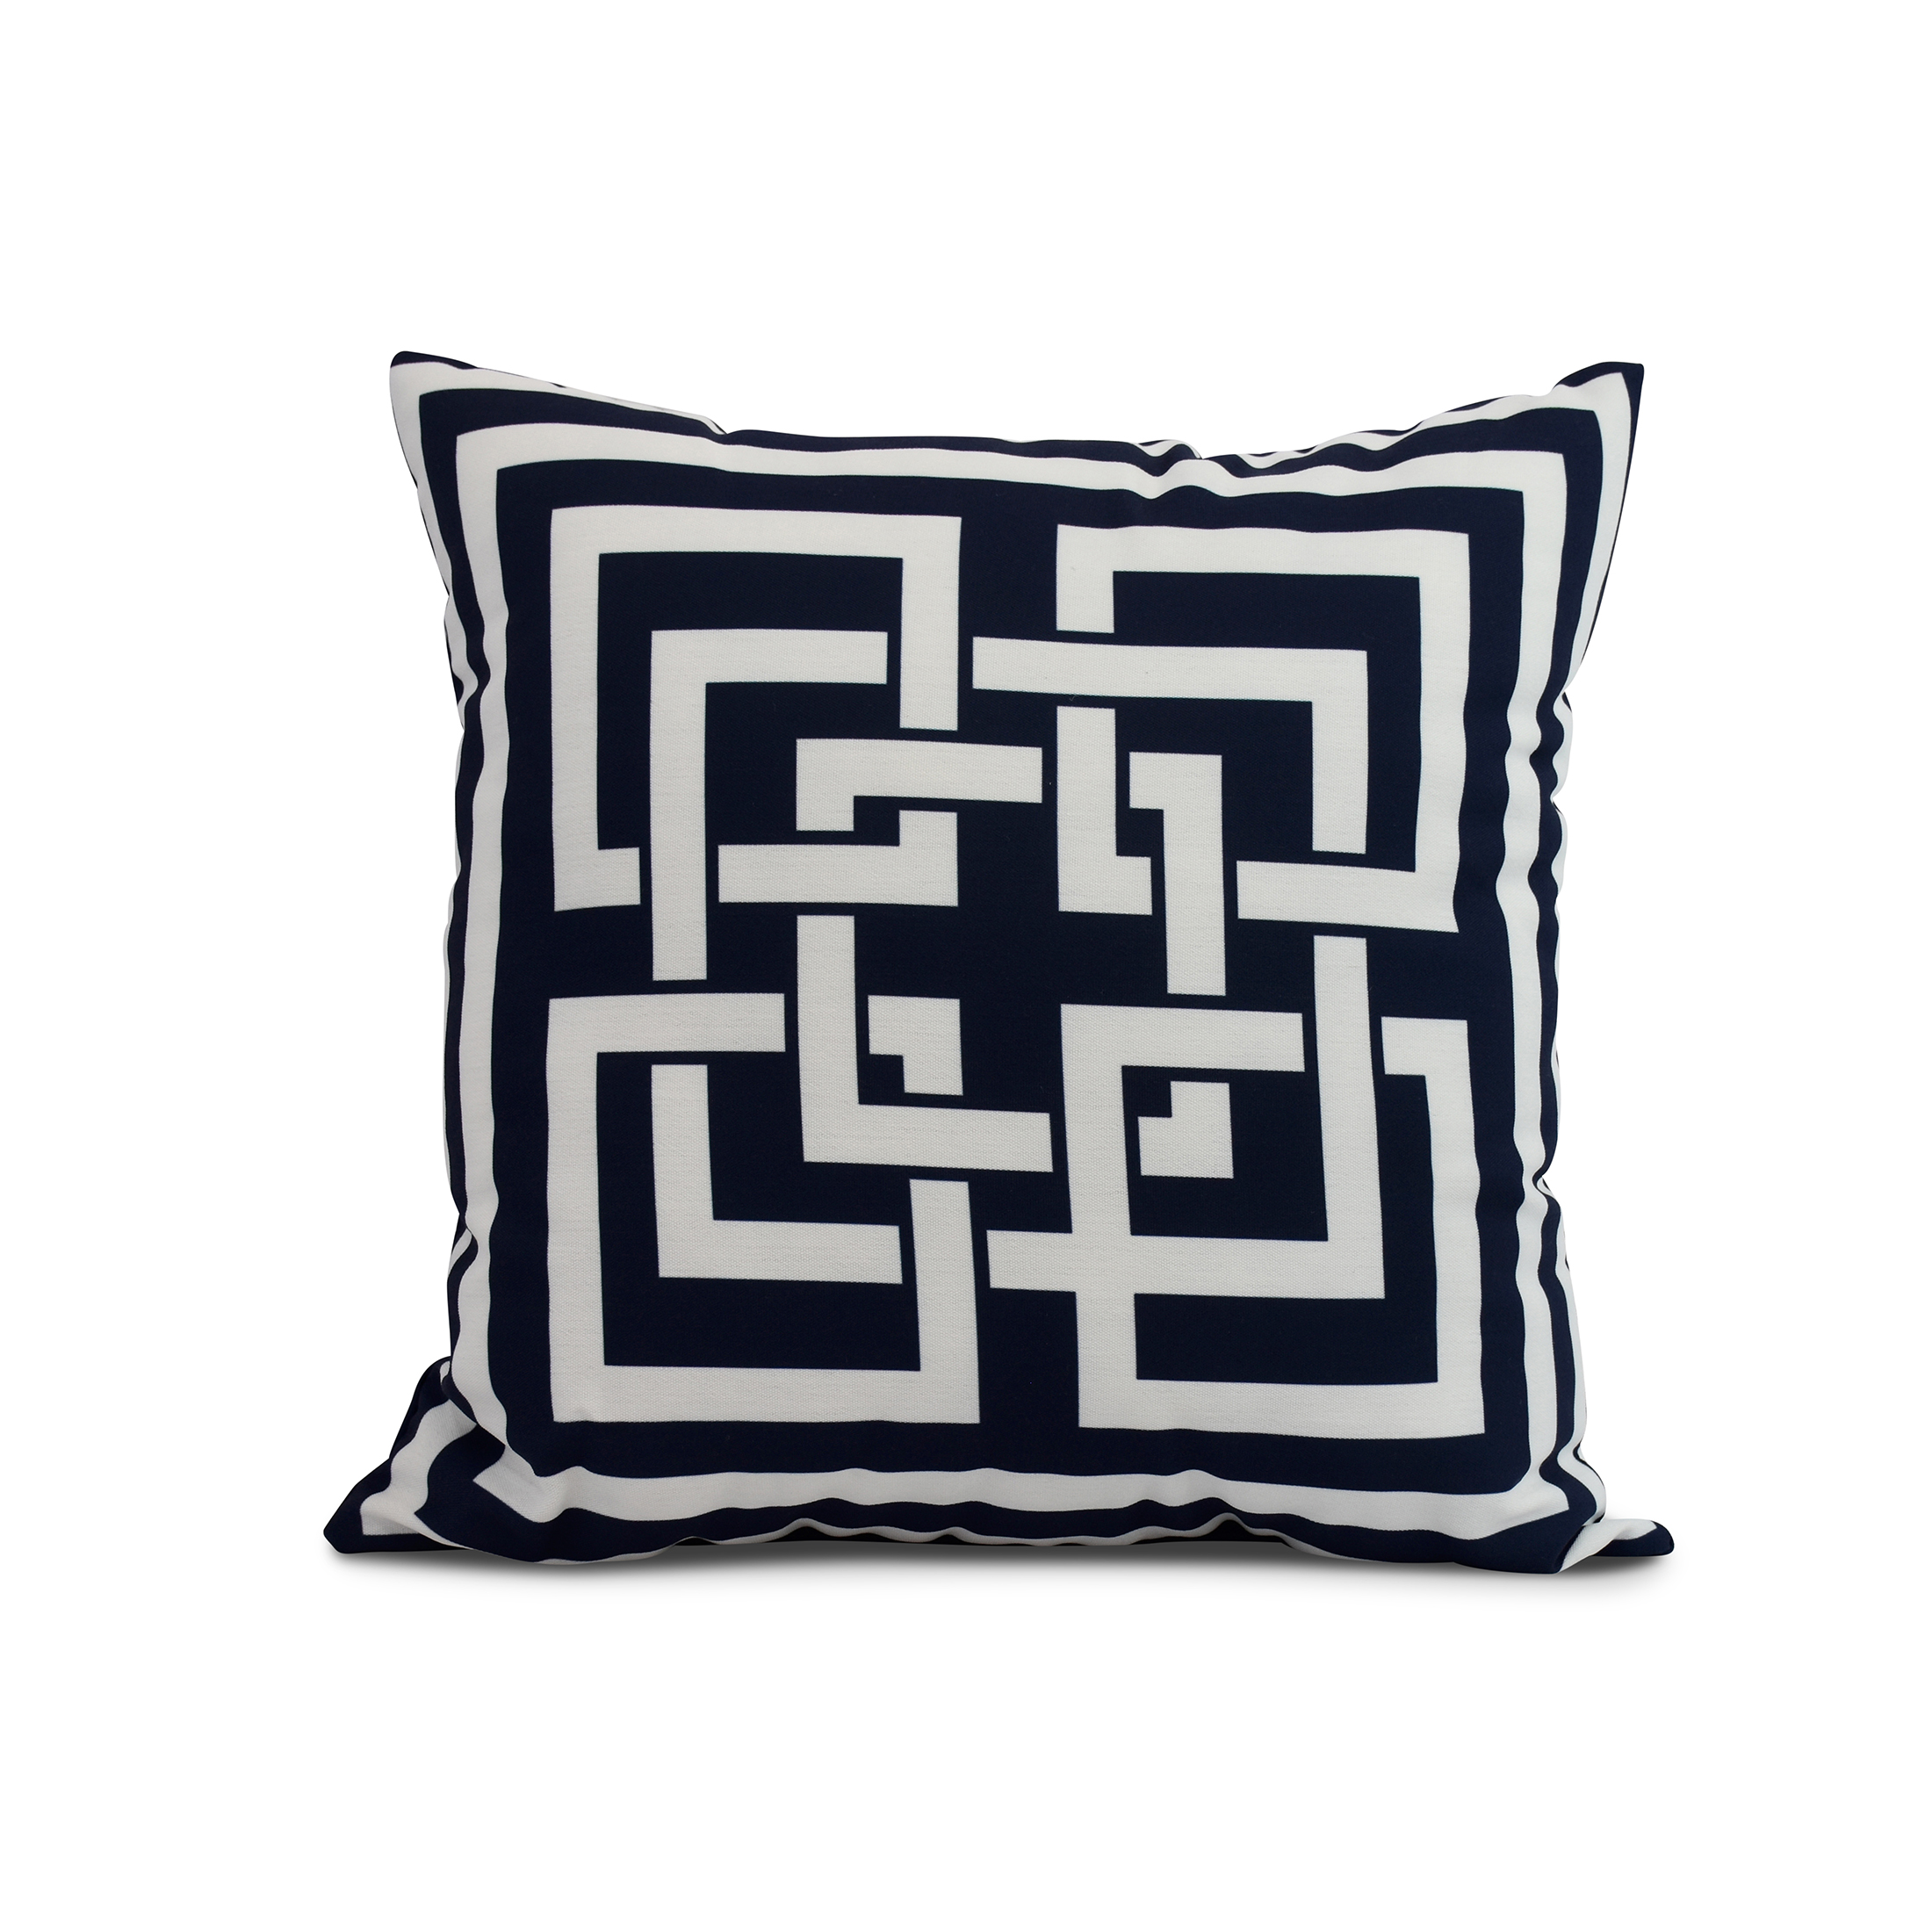 Simply Daisy, 16 x 16inch, Greek New Key, Geometric Print Pillow, Navy